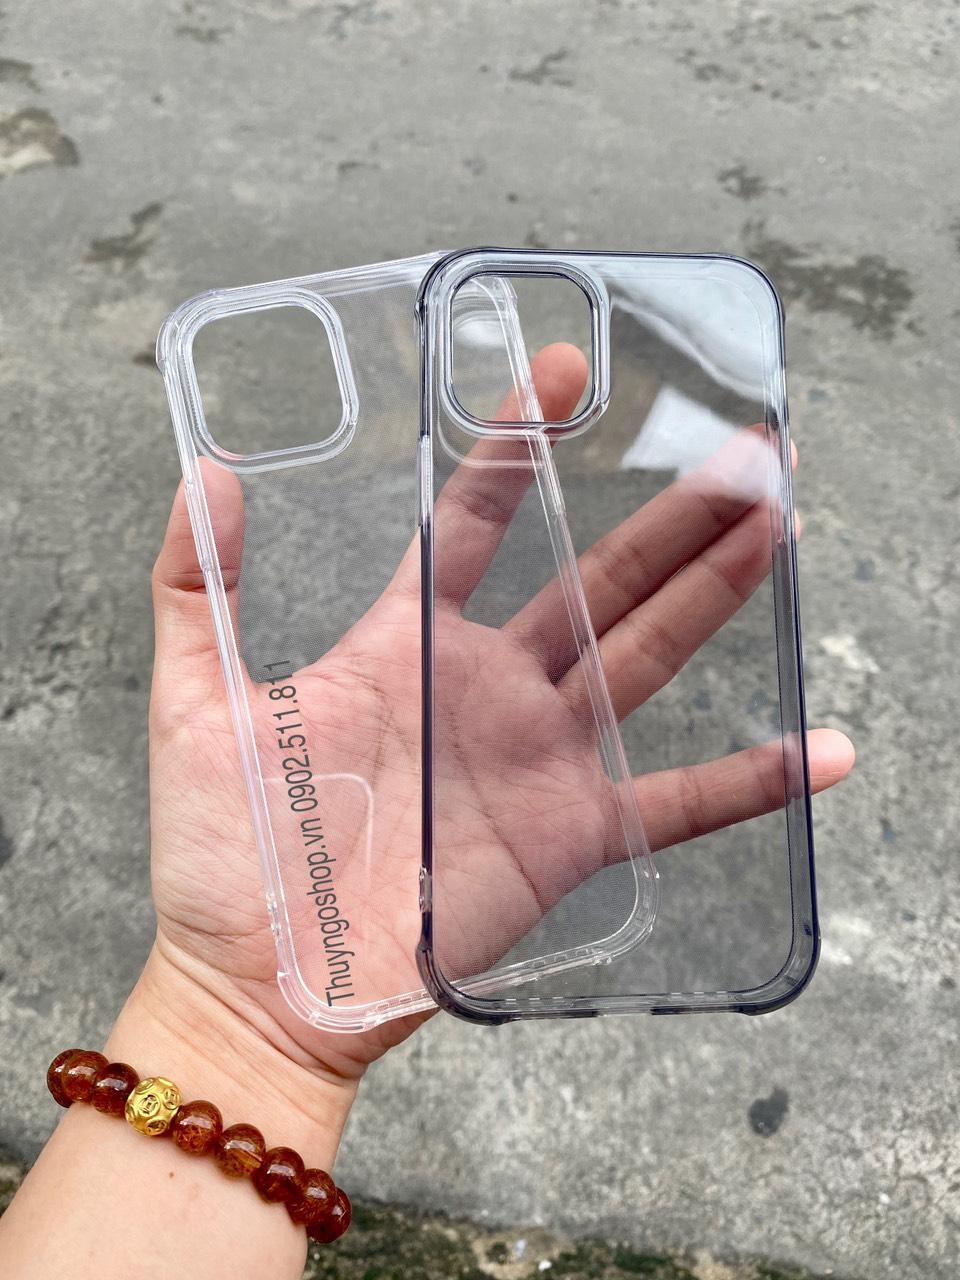 Ốp dẻo chống sốc LEEU Iphone 12 Pro Max